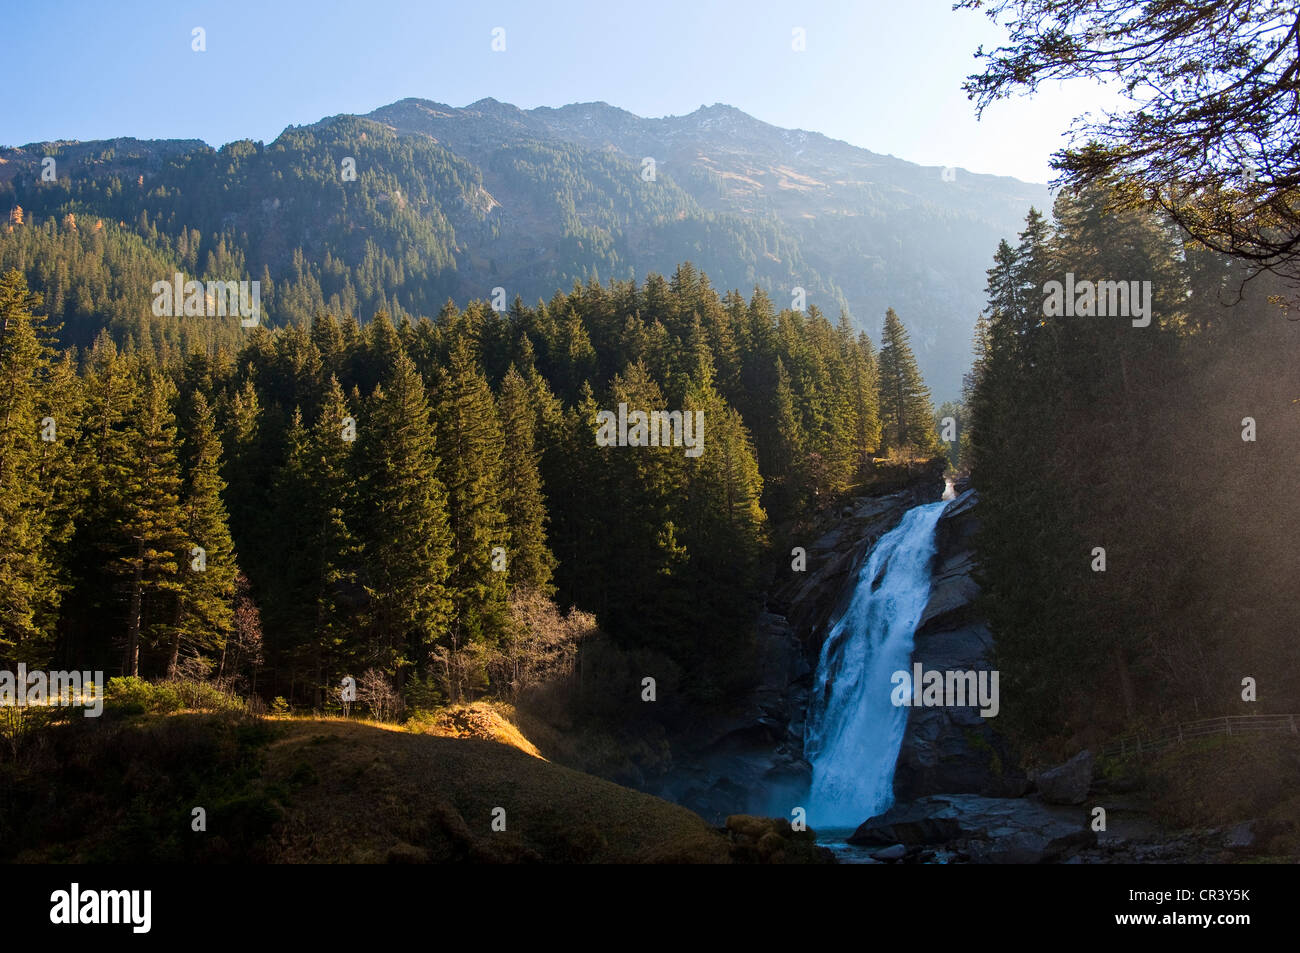 Austria, Salzburgo Tierra, Krimml, parque nacional Hohe Tauern, circuito turístico de cascada Krimml, Krimmler Wasserfälle Foto de stock